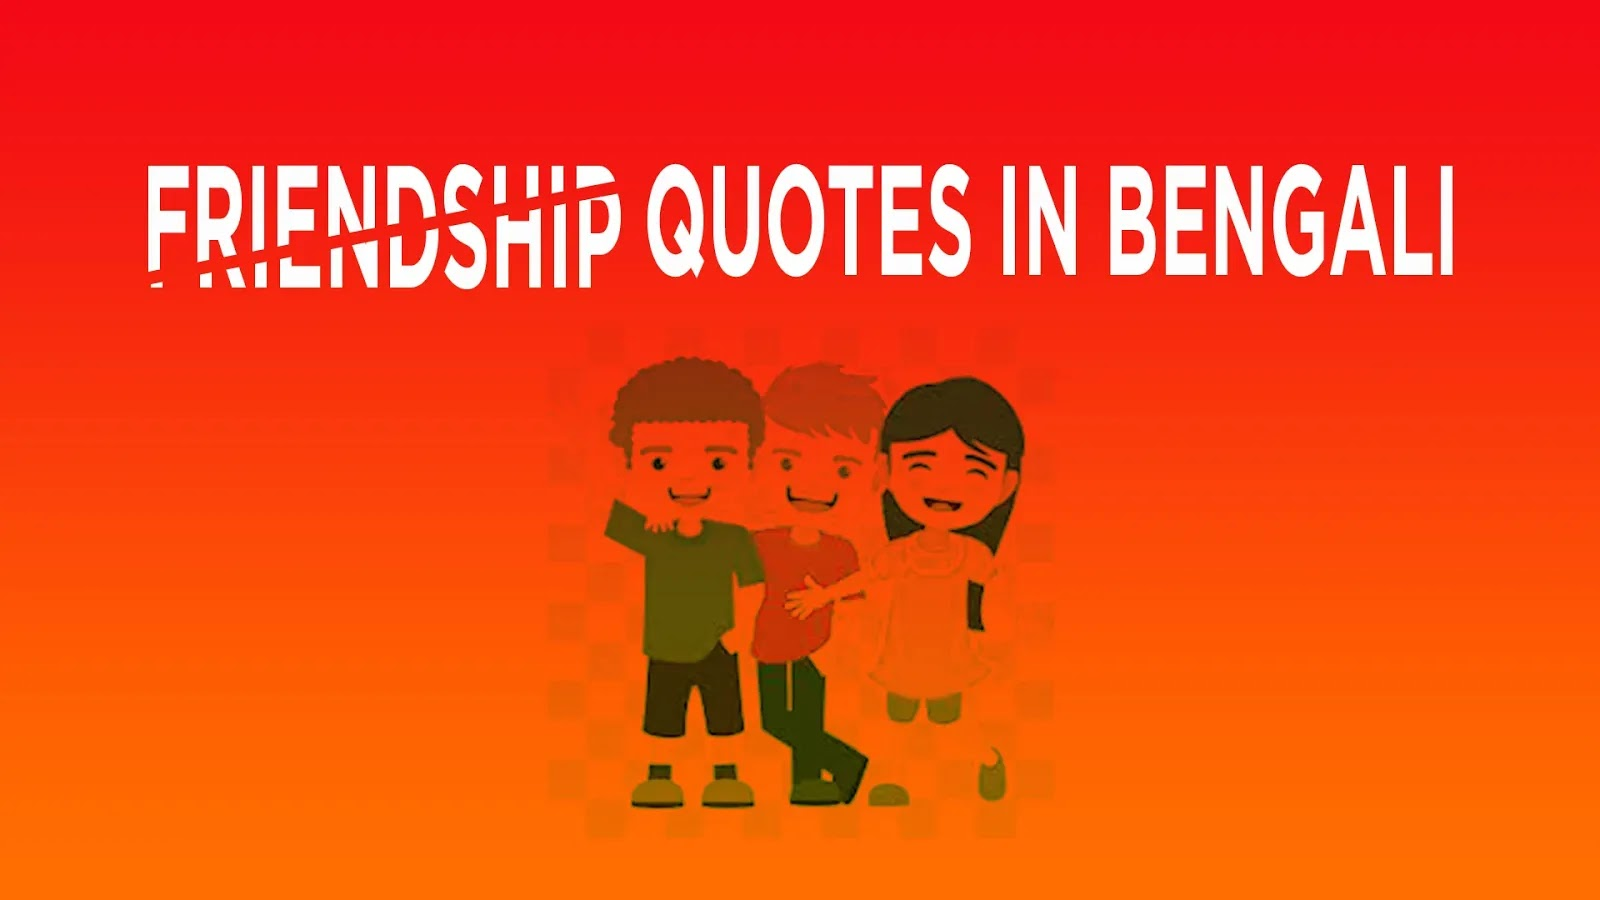 friendship day bengali images,friendship quotes bengali,friendship day quotes bengali,friendship quotes bengali language,quotes